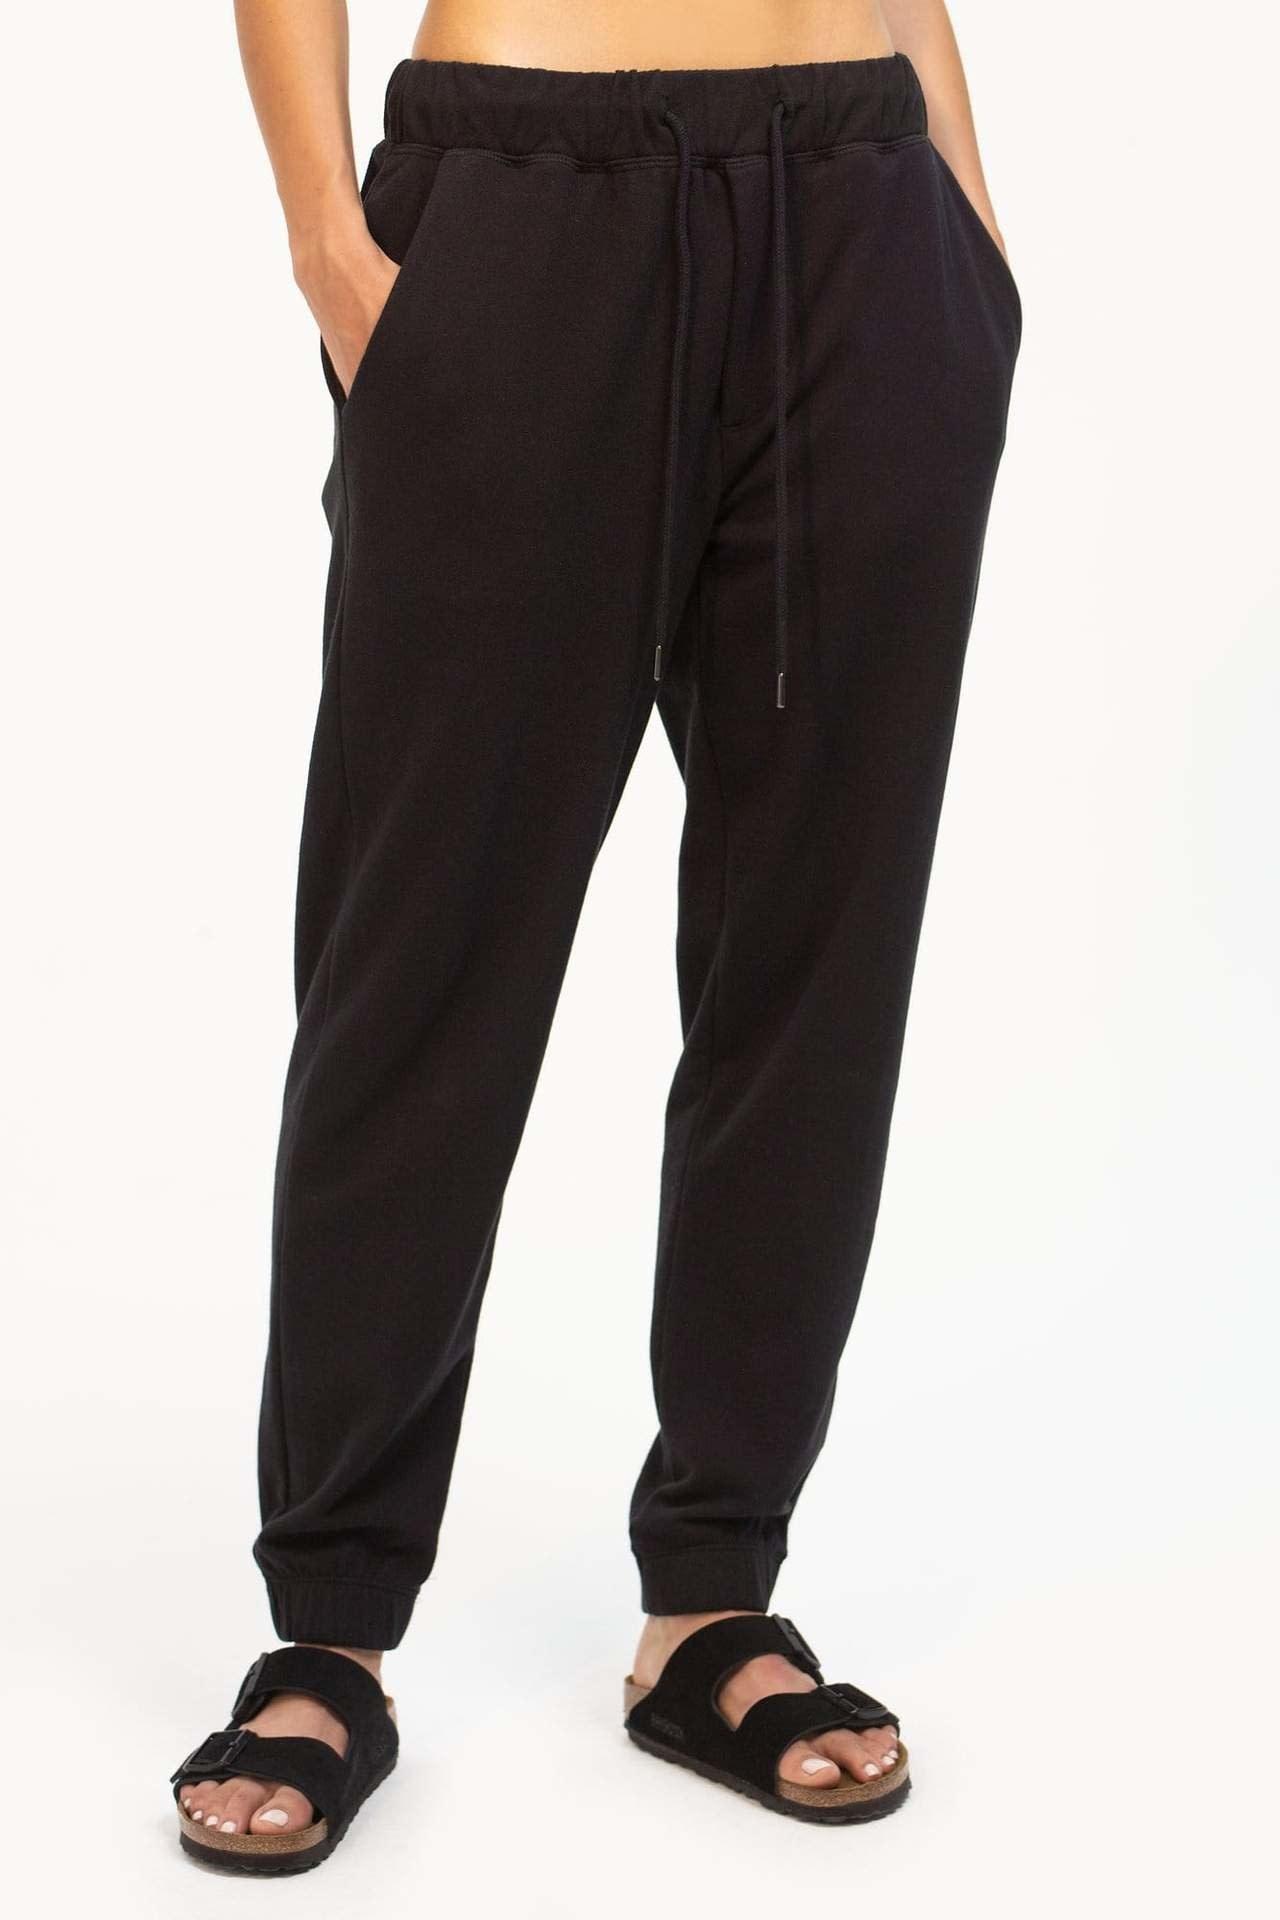 Splits59 Franky Sweatpant Washed Black